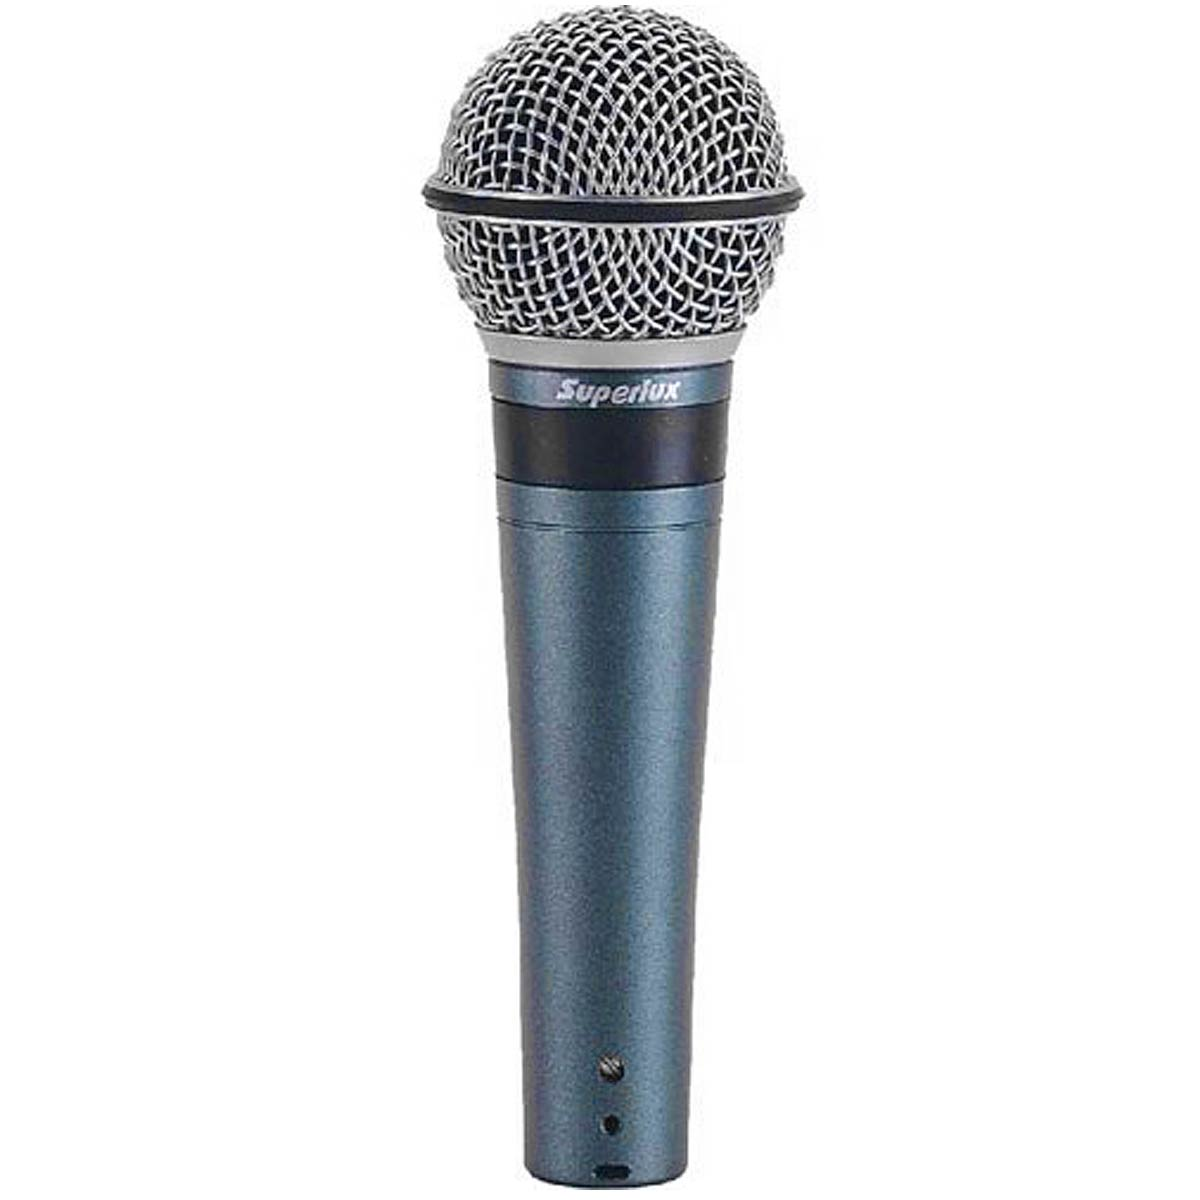 PRO248 - Microfone c/ Fio de Mão p/ Estúdio PRO 248 - Superlux